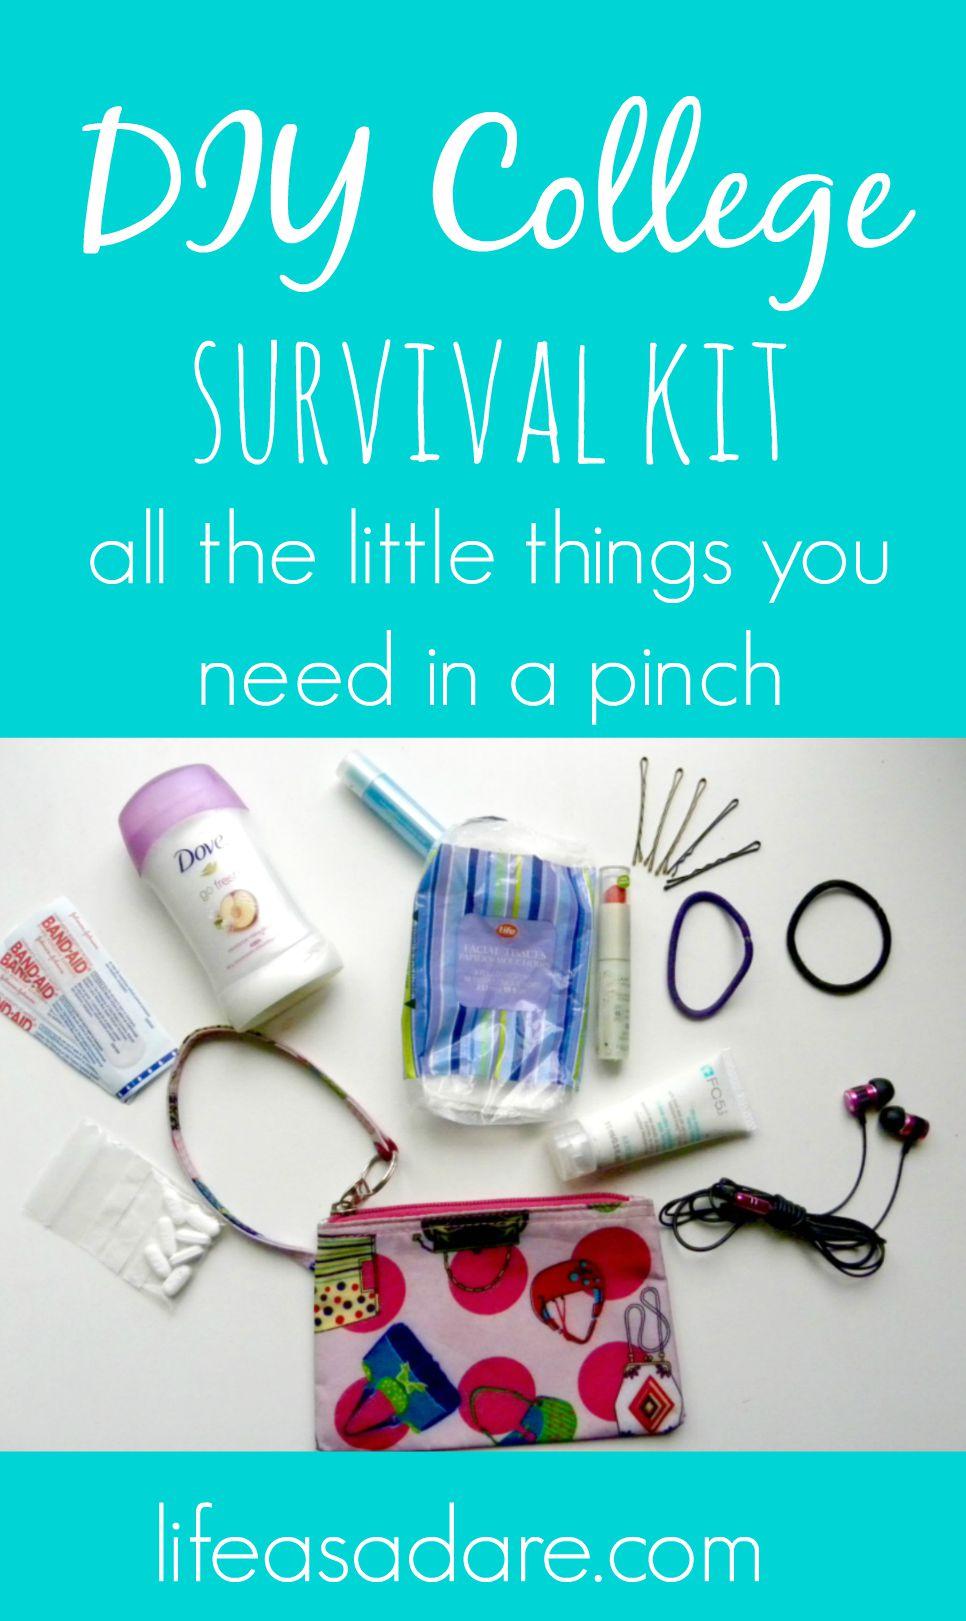 College Survival Kit Ideas : college, survival, ideas, College, Survival